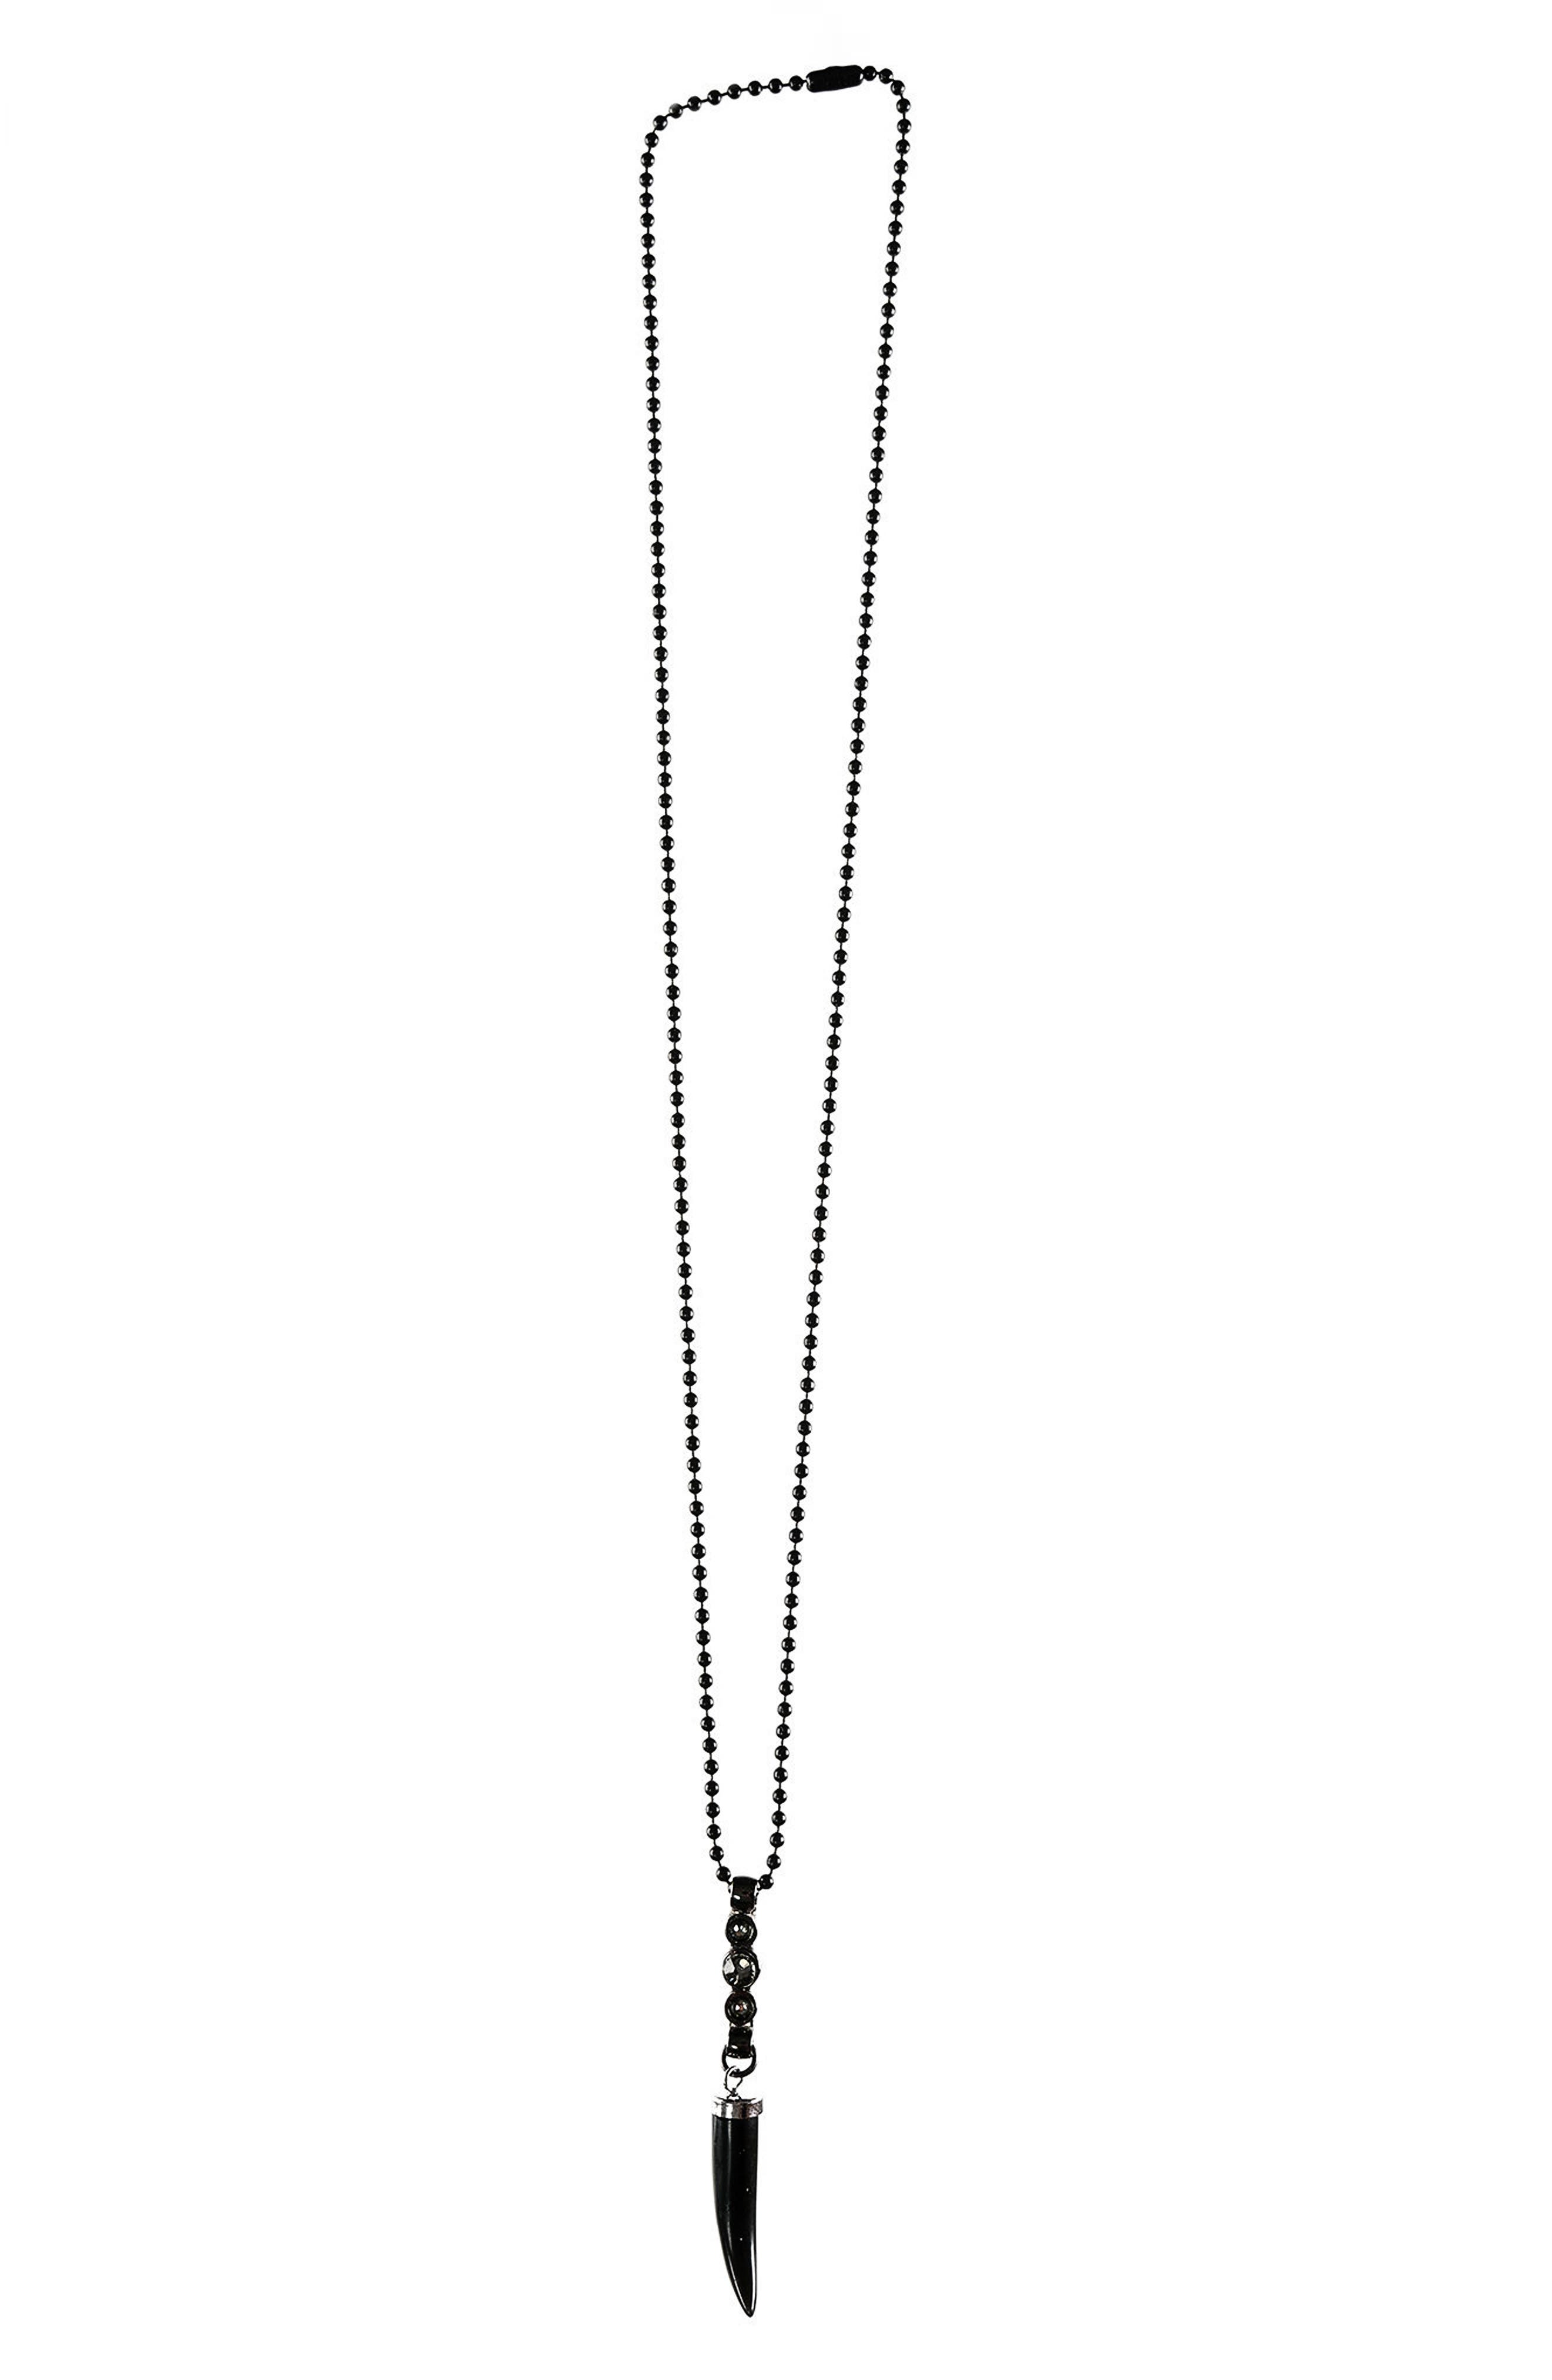 Horn Pendant Necklace,                             Main thumbnail 1, color,                             Black Giamond Crystal Agate